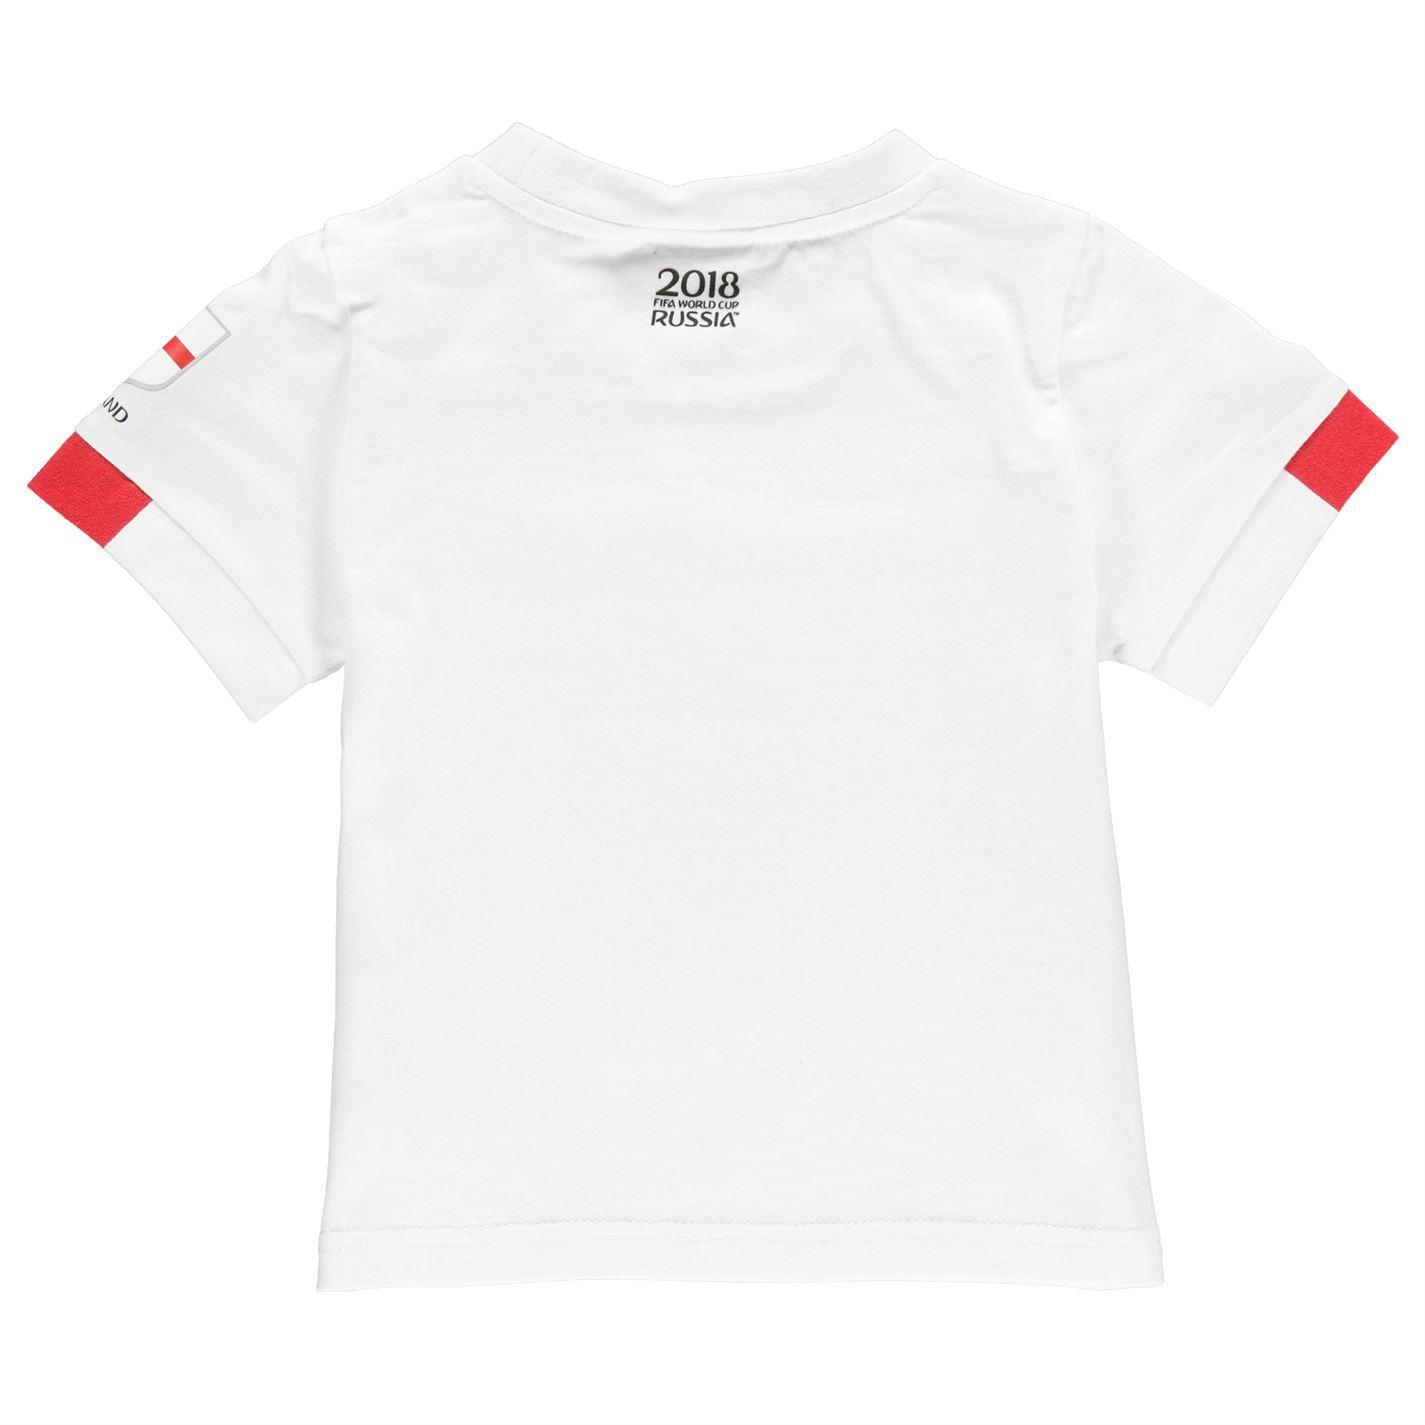 24e0c0855 FIFA World Cup 2018 England Mascot T-Shirt Infants White Football Soccer Tee  Top